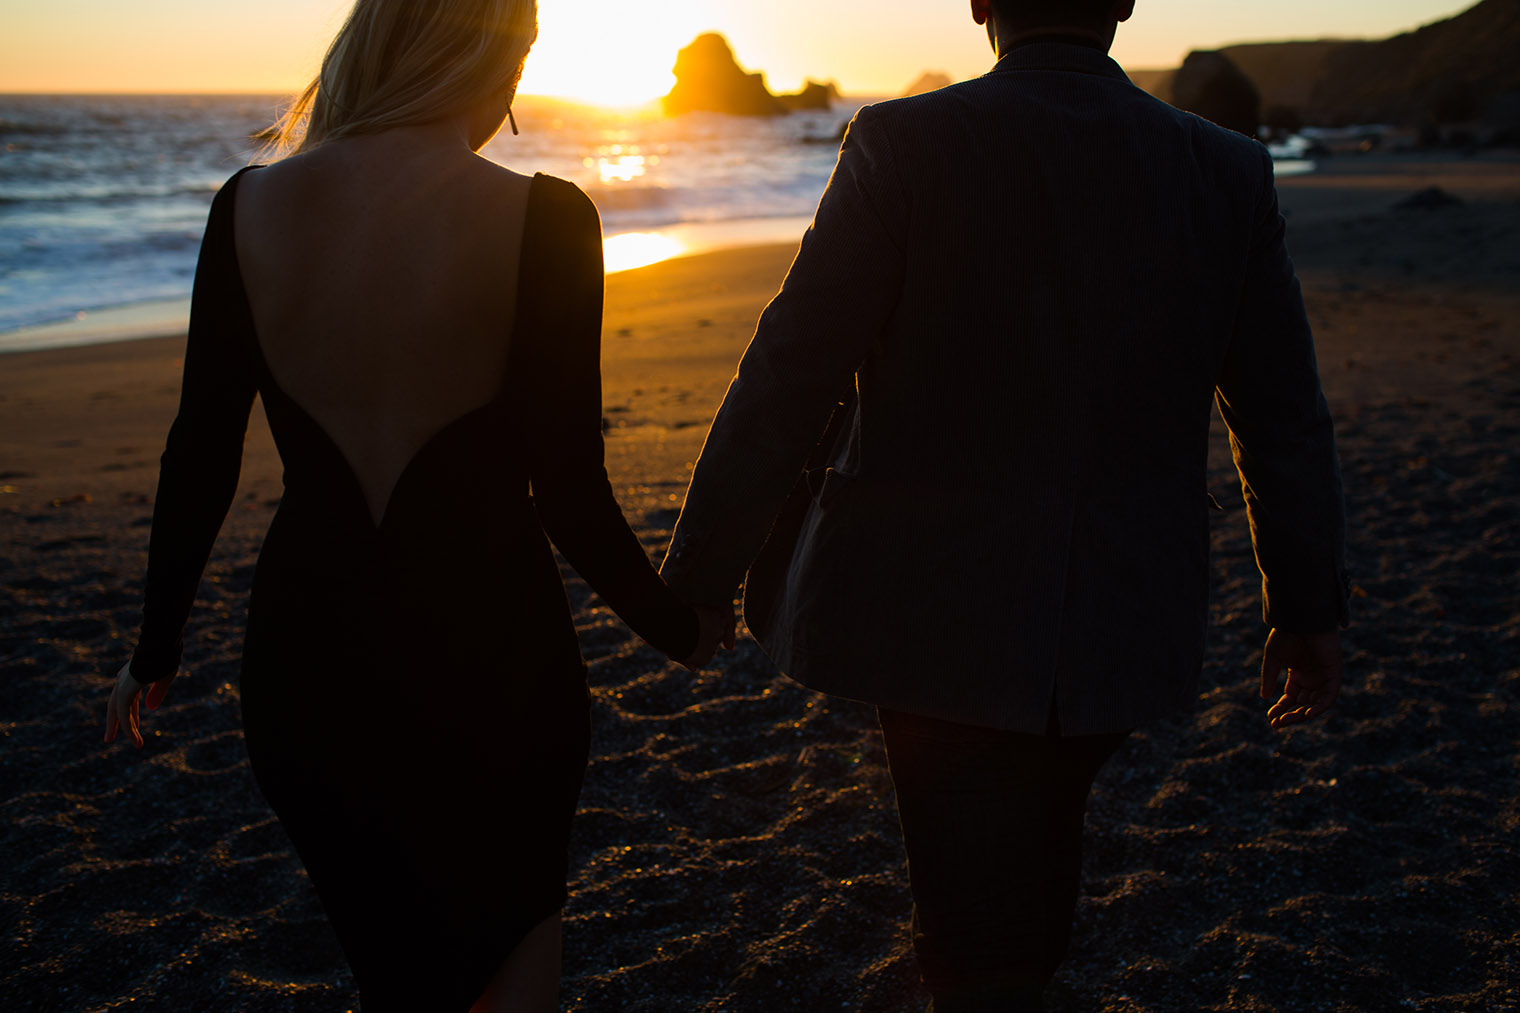 sonoma coast state park couple photos